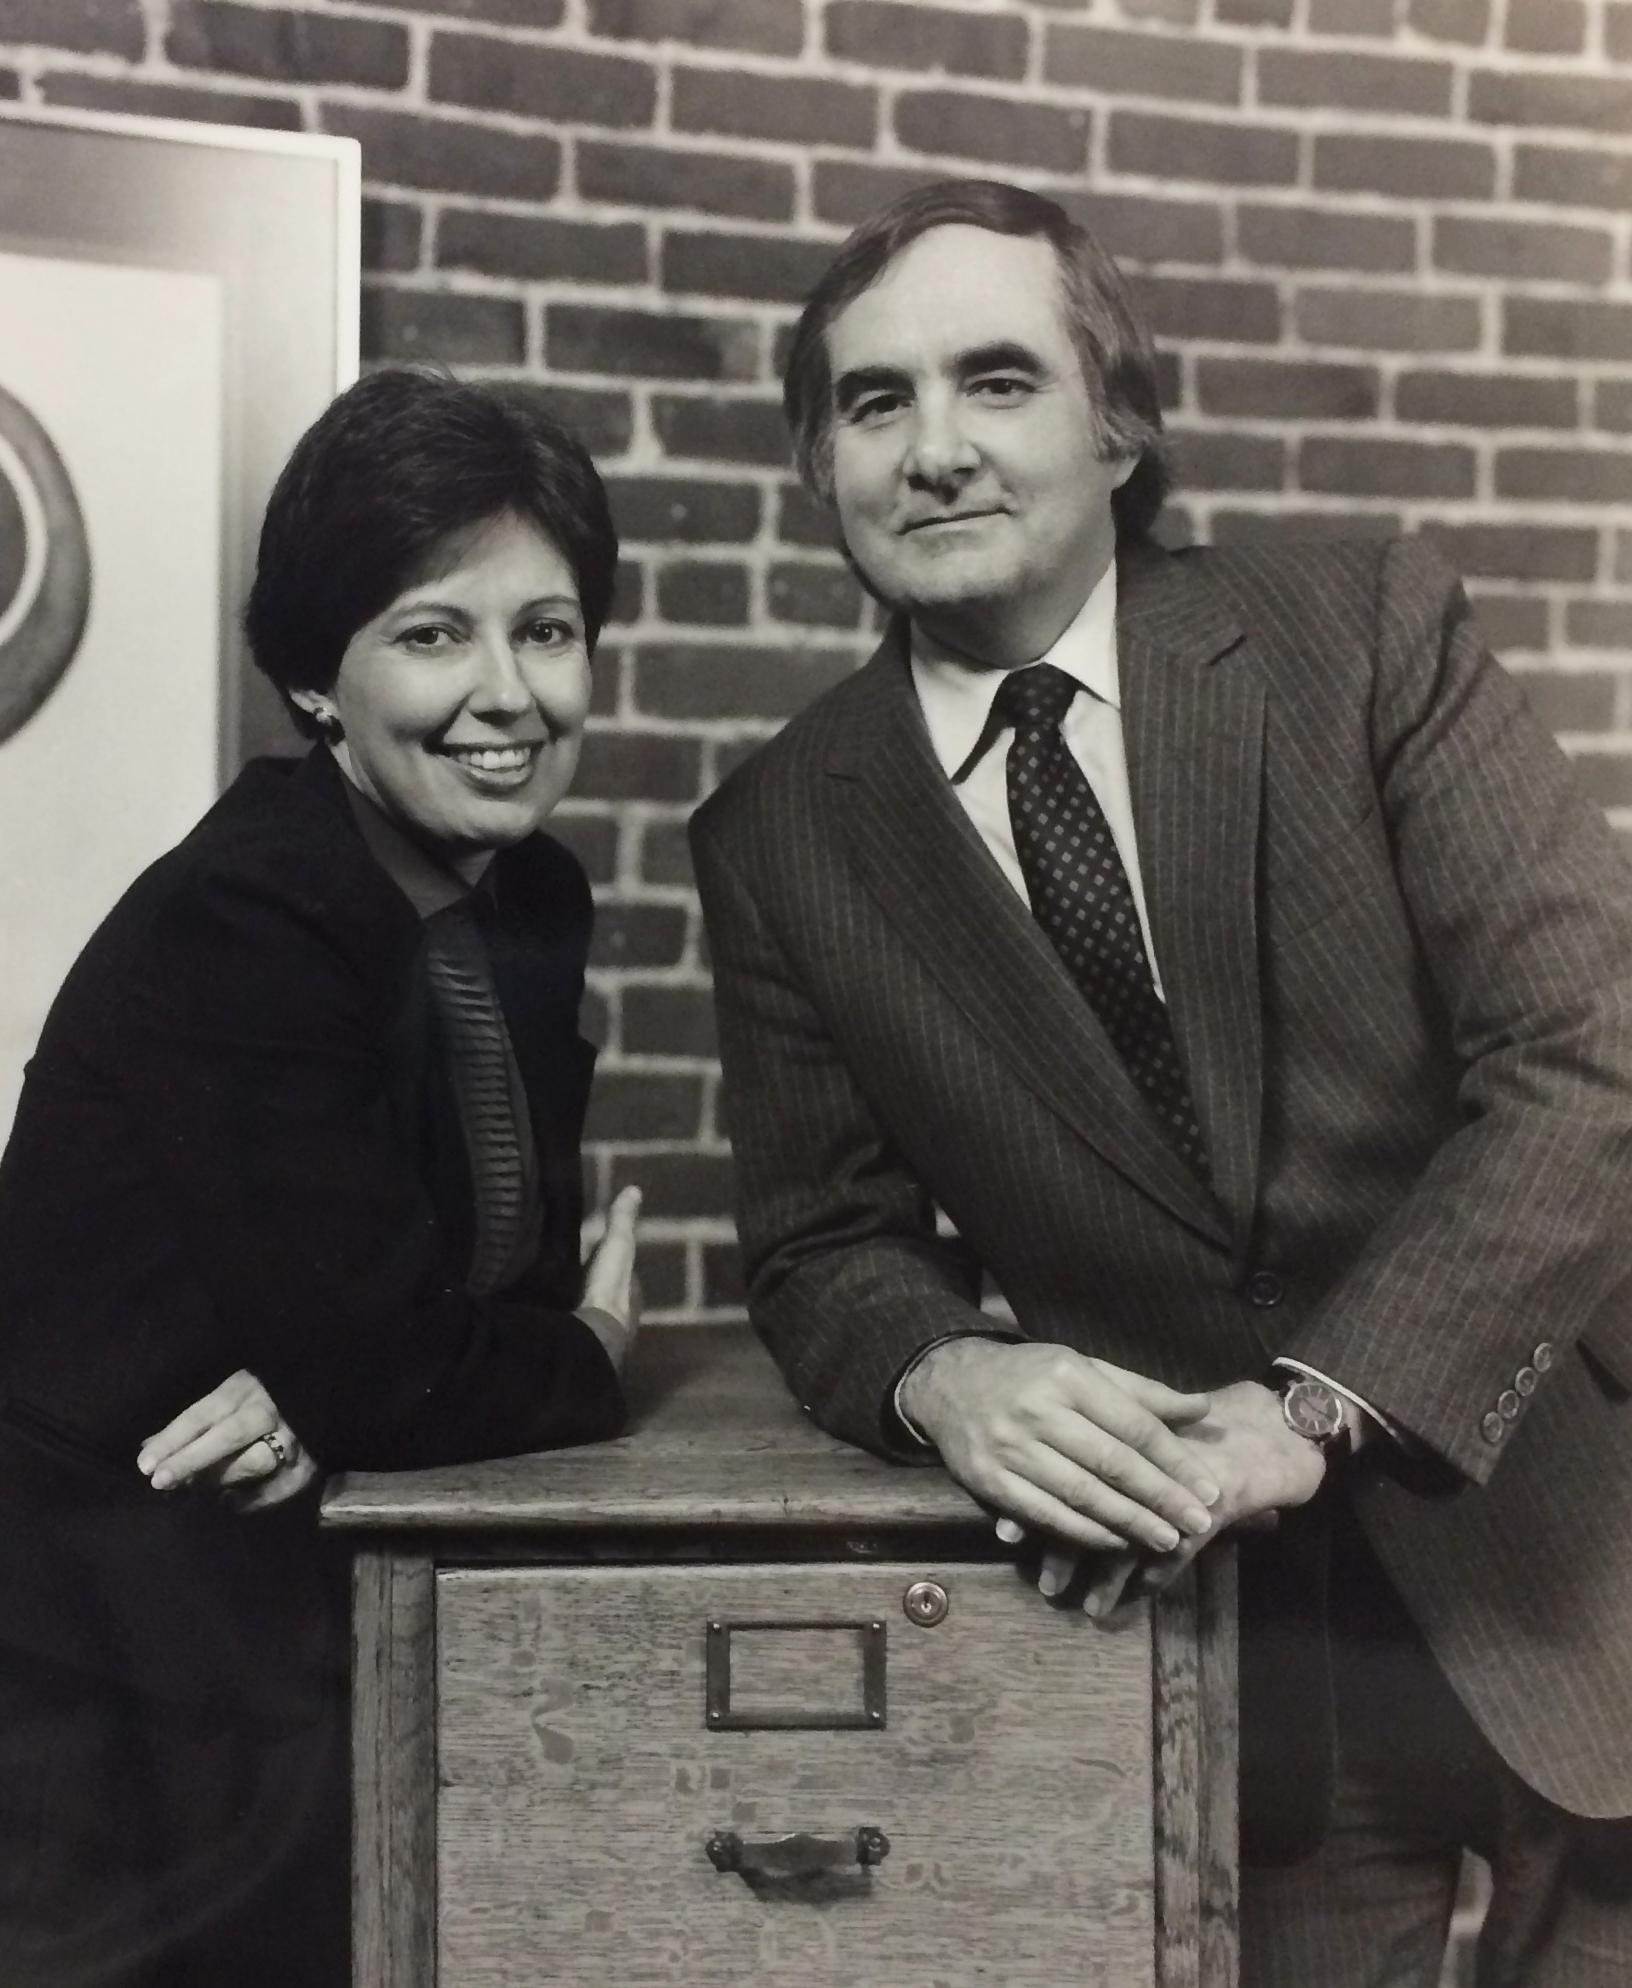 Anne Bailey Berman and John Martin CMB